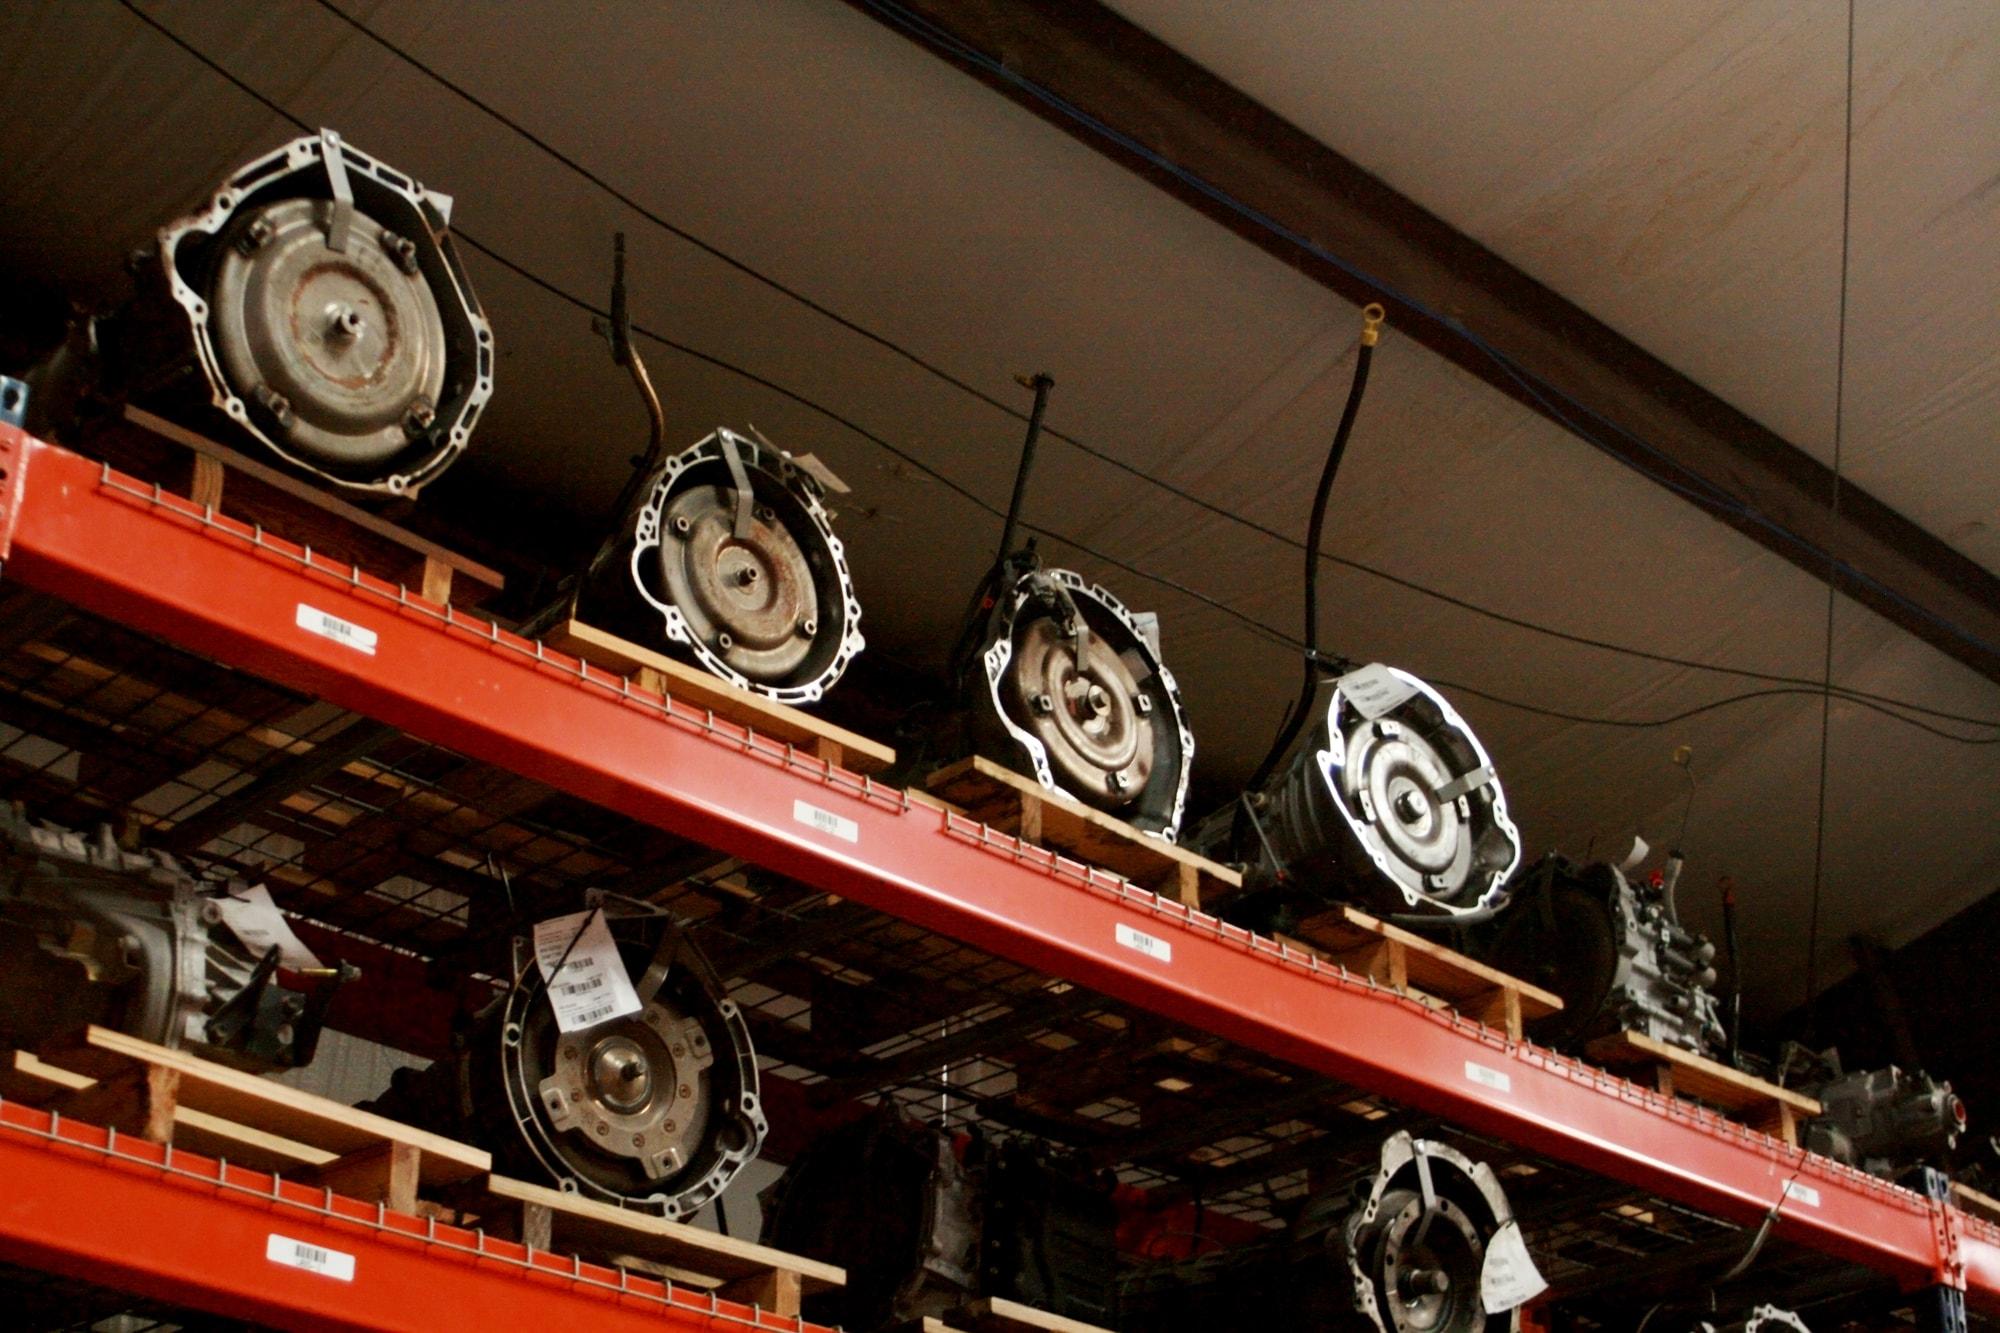 Used Engines on shelfs